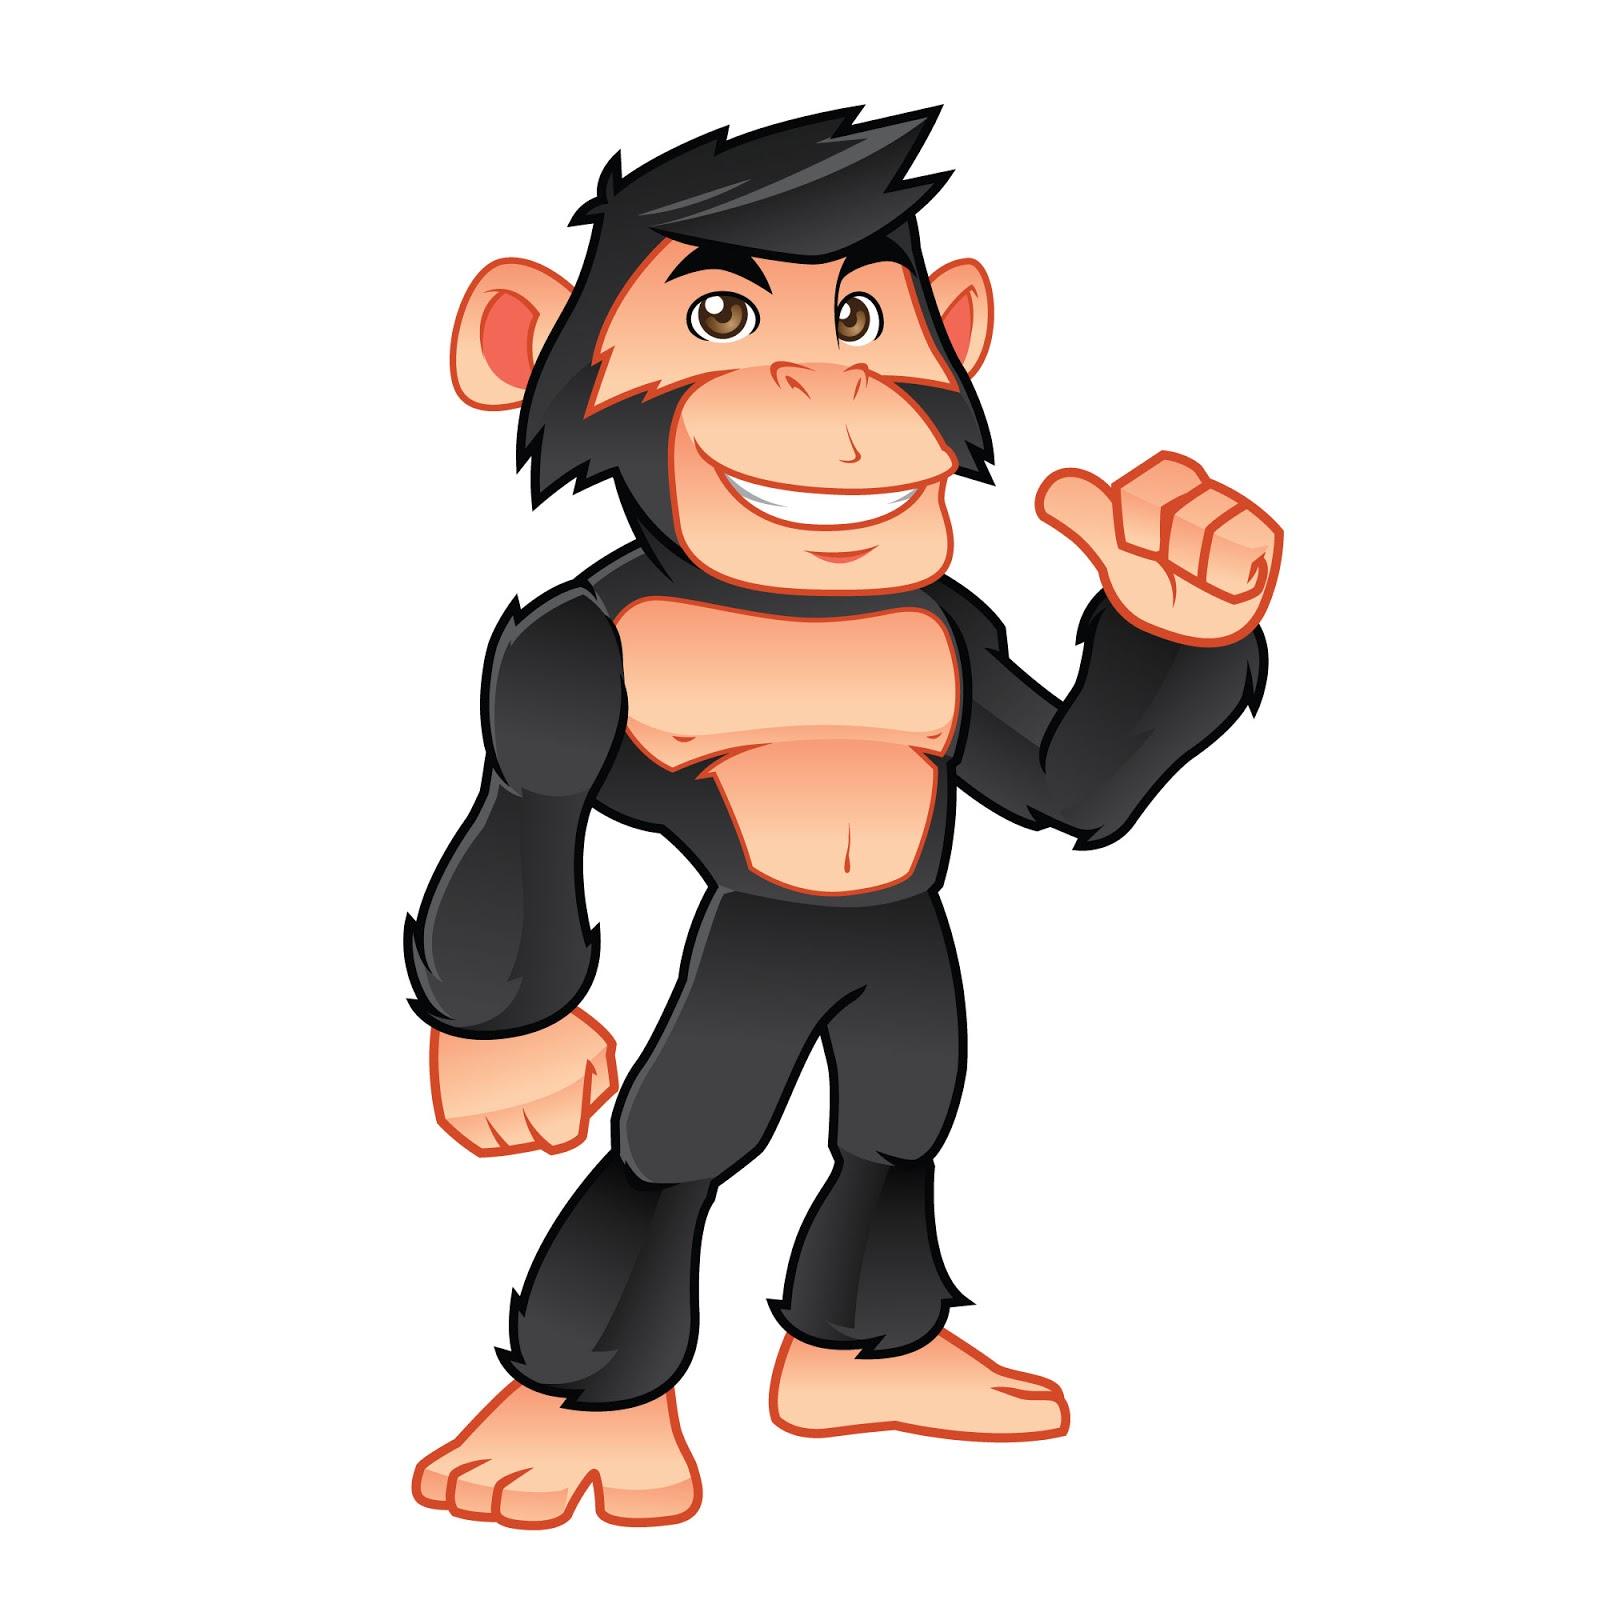 Chimp Mascot Logo Free Download Vector CDR, AI, EPS and PNG Formats